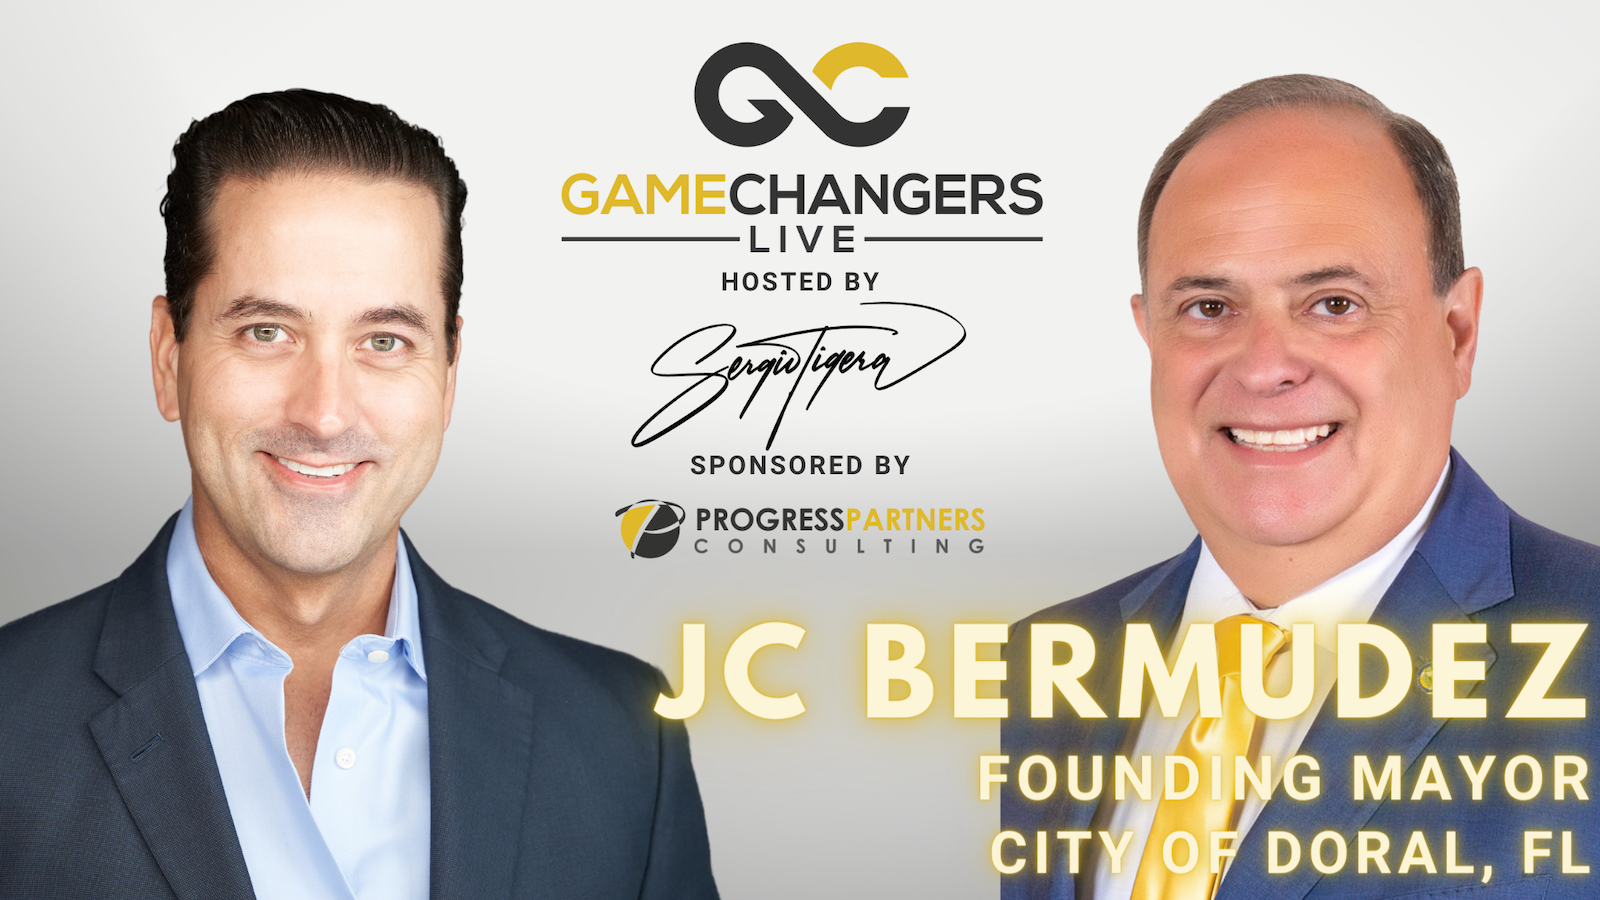 Gamechangers LIVE featuring JC Bermudez